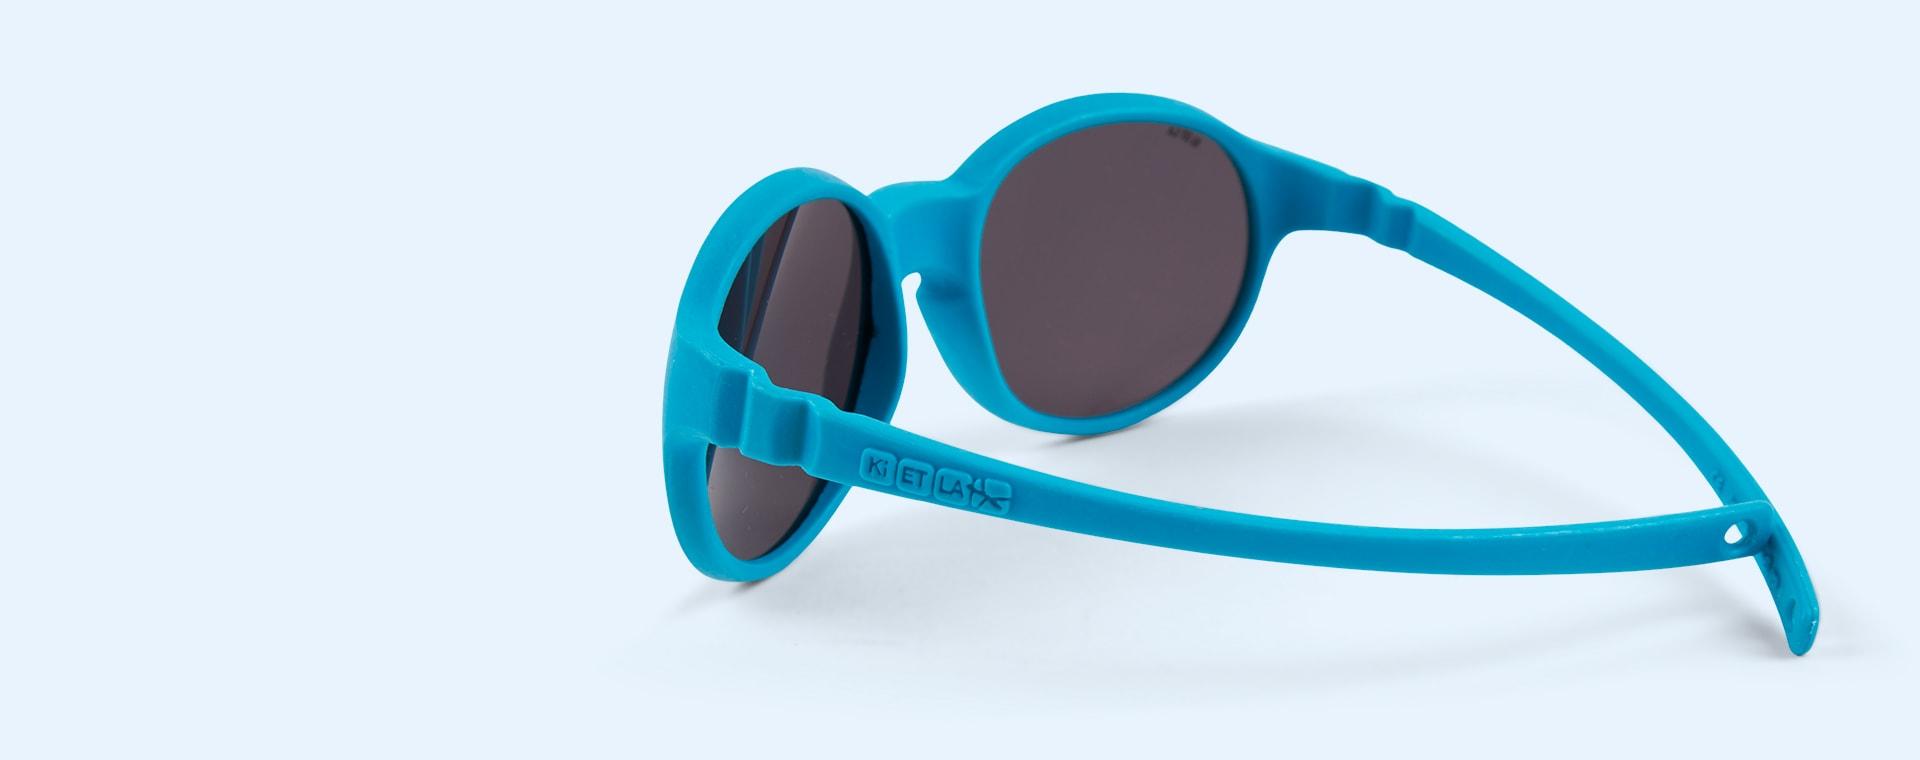 Canard Ki ET LA Jokakids' Kids Sunglasses